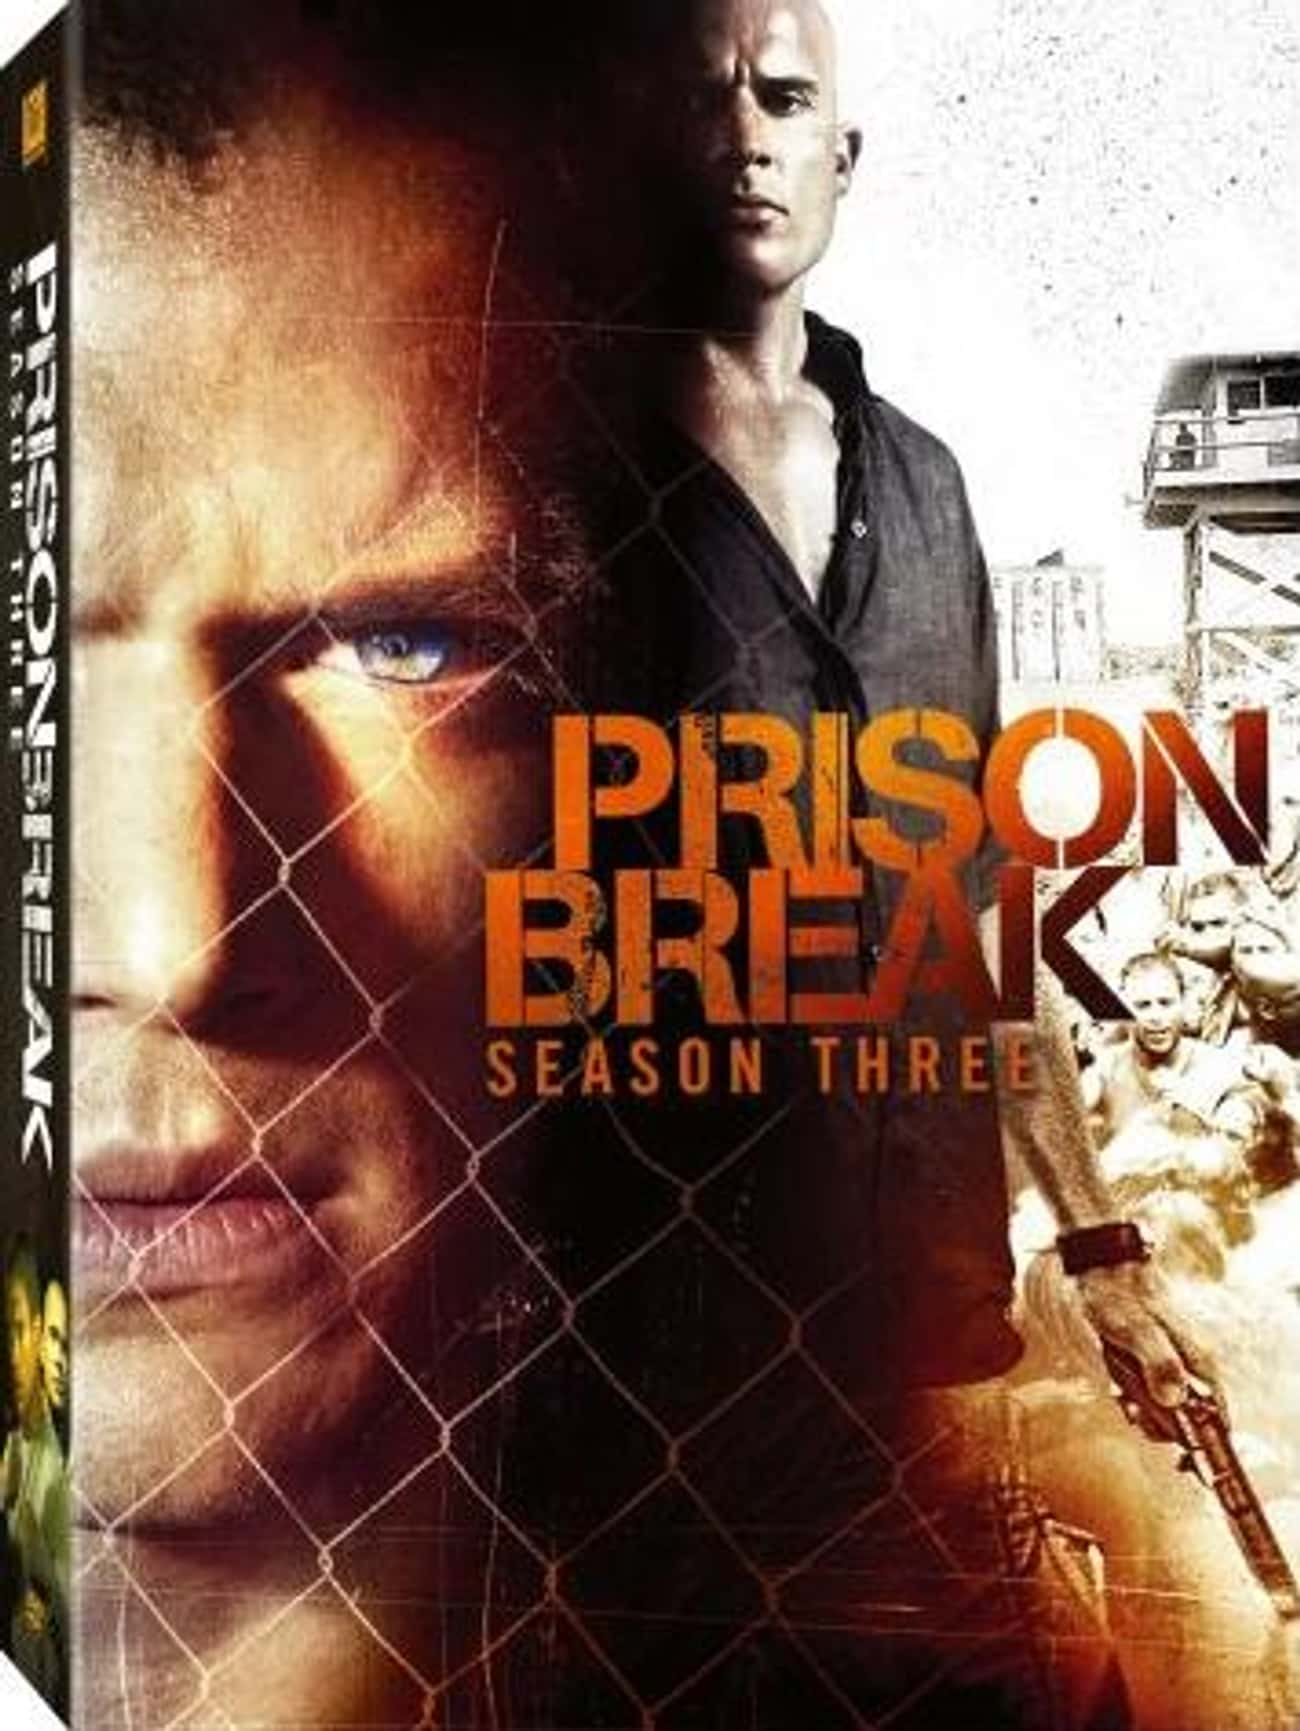 Prison Break - Season 3 is listed (or ranked) 3 on the list The Best Seasons of Prison Break